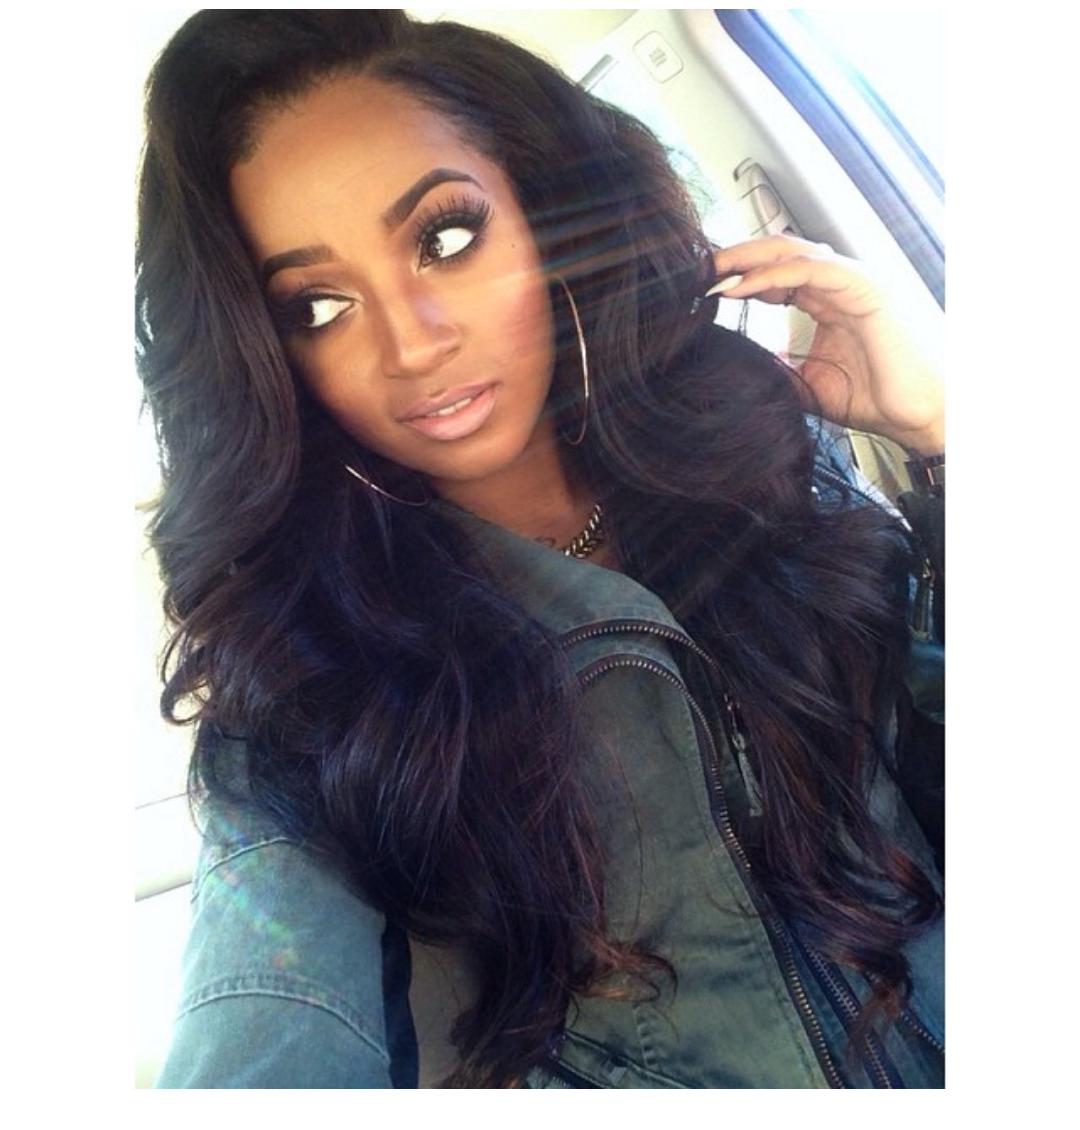 I Love To See Kinky Hair Weave on Black Women!